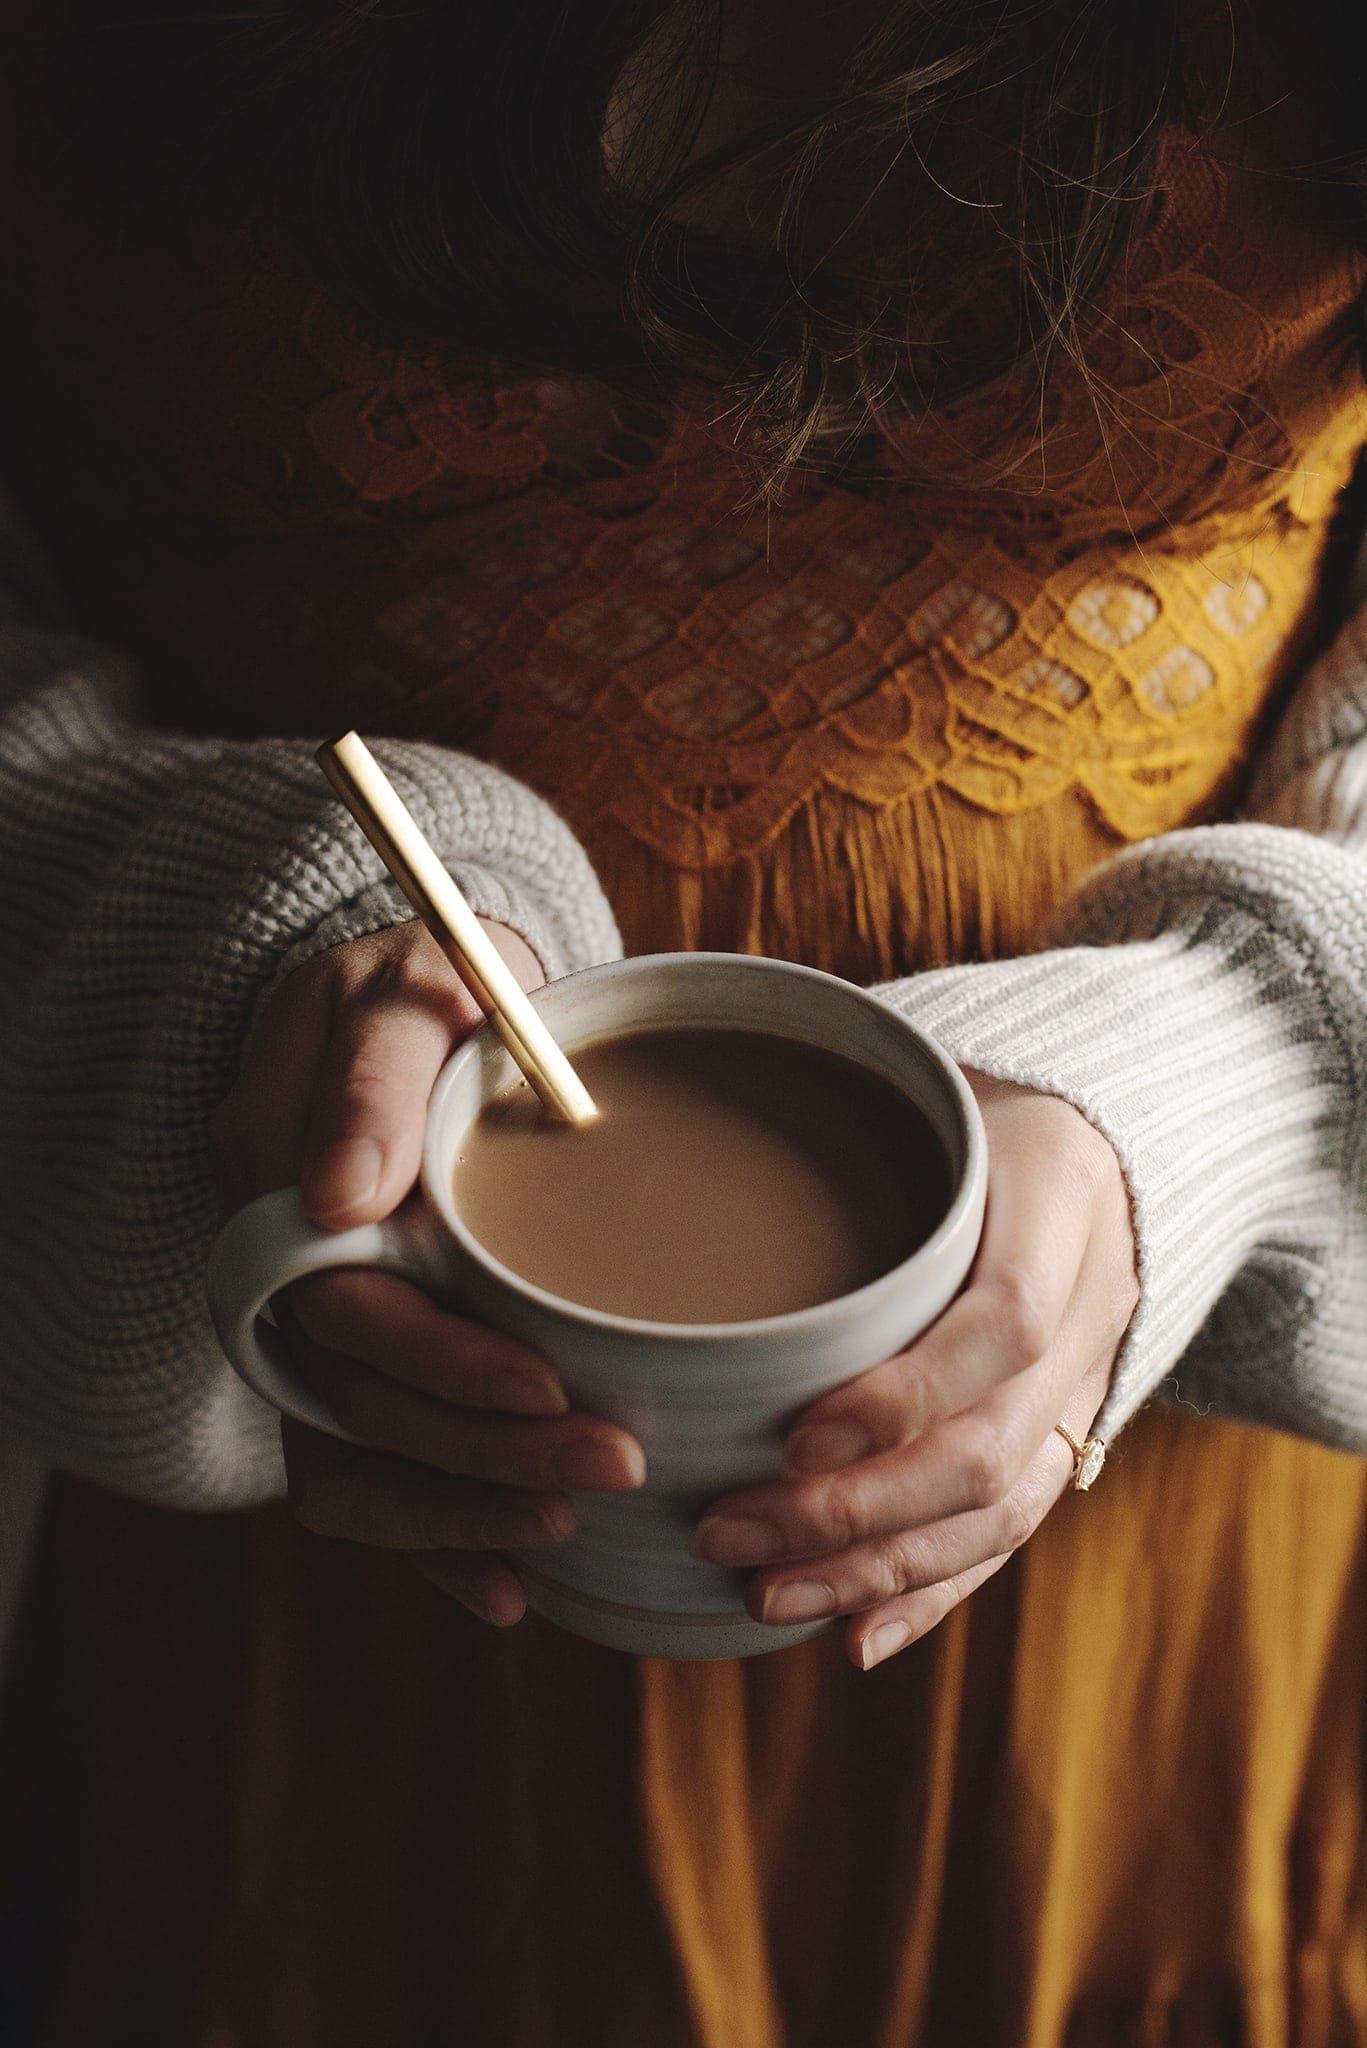 Holding a mug of Amarula caffe mocha in hands